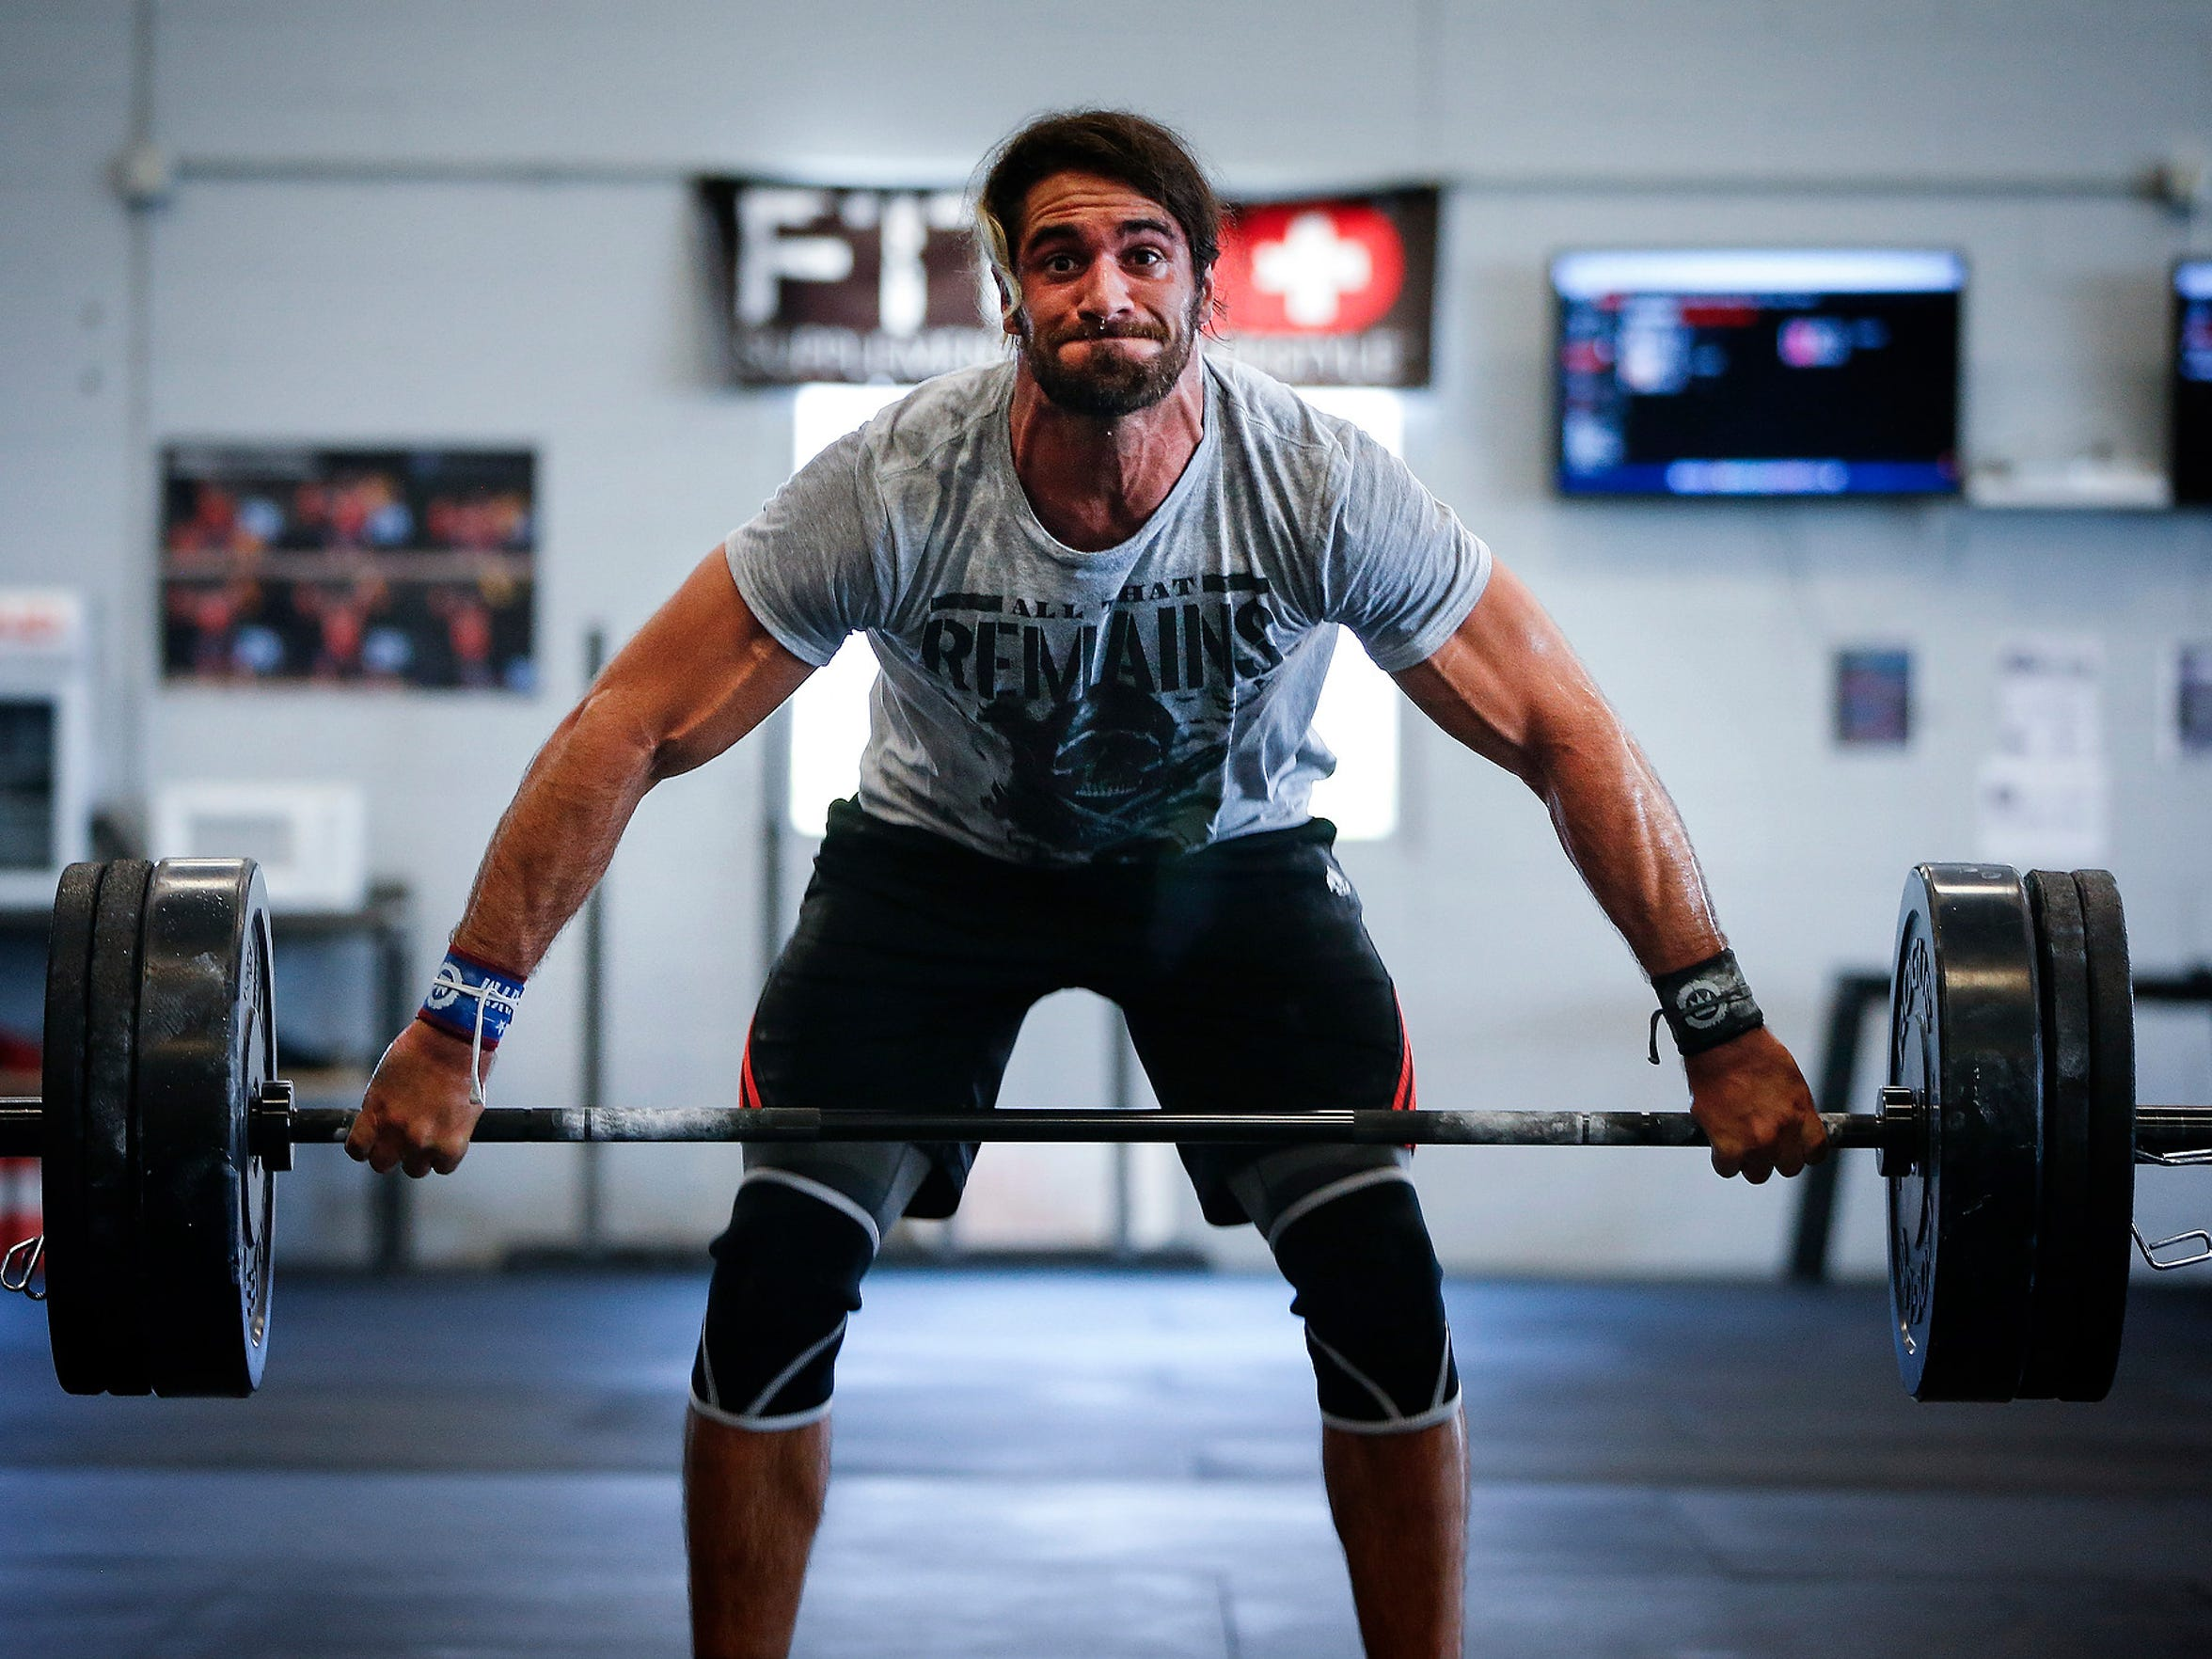 12:56PM: WWE Champion and Davenport native Seth Rollins